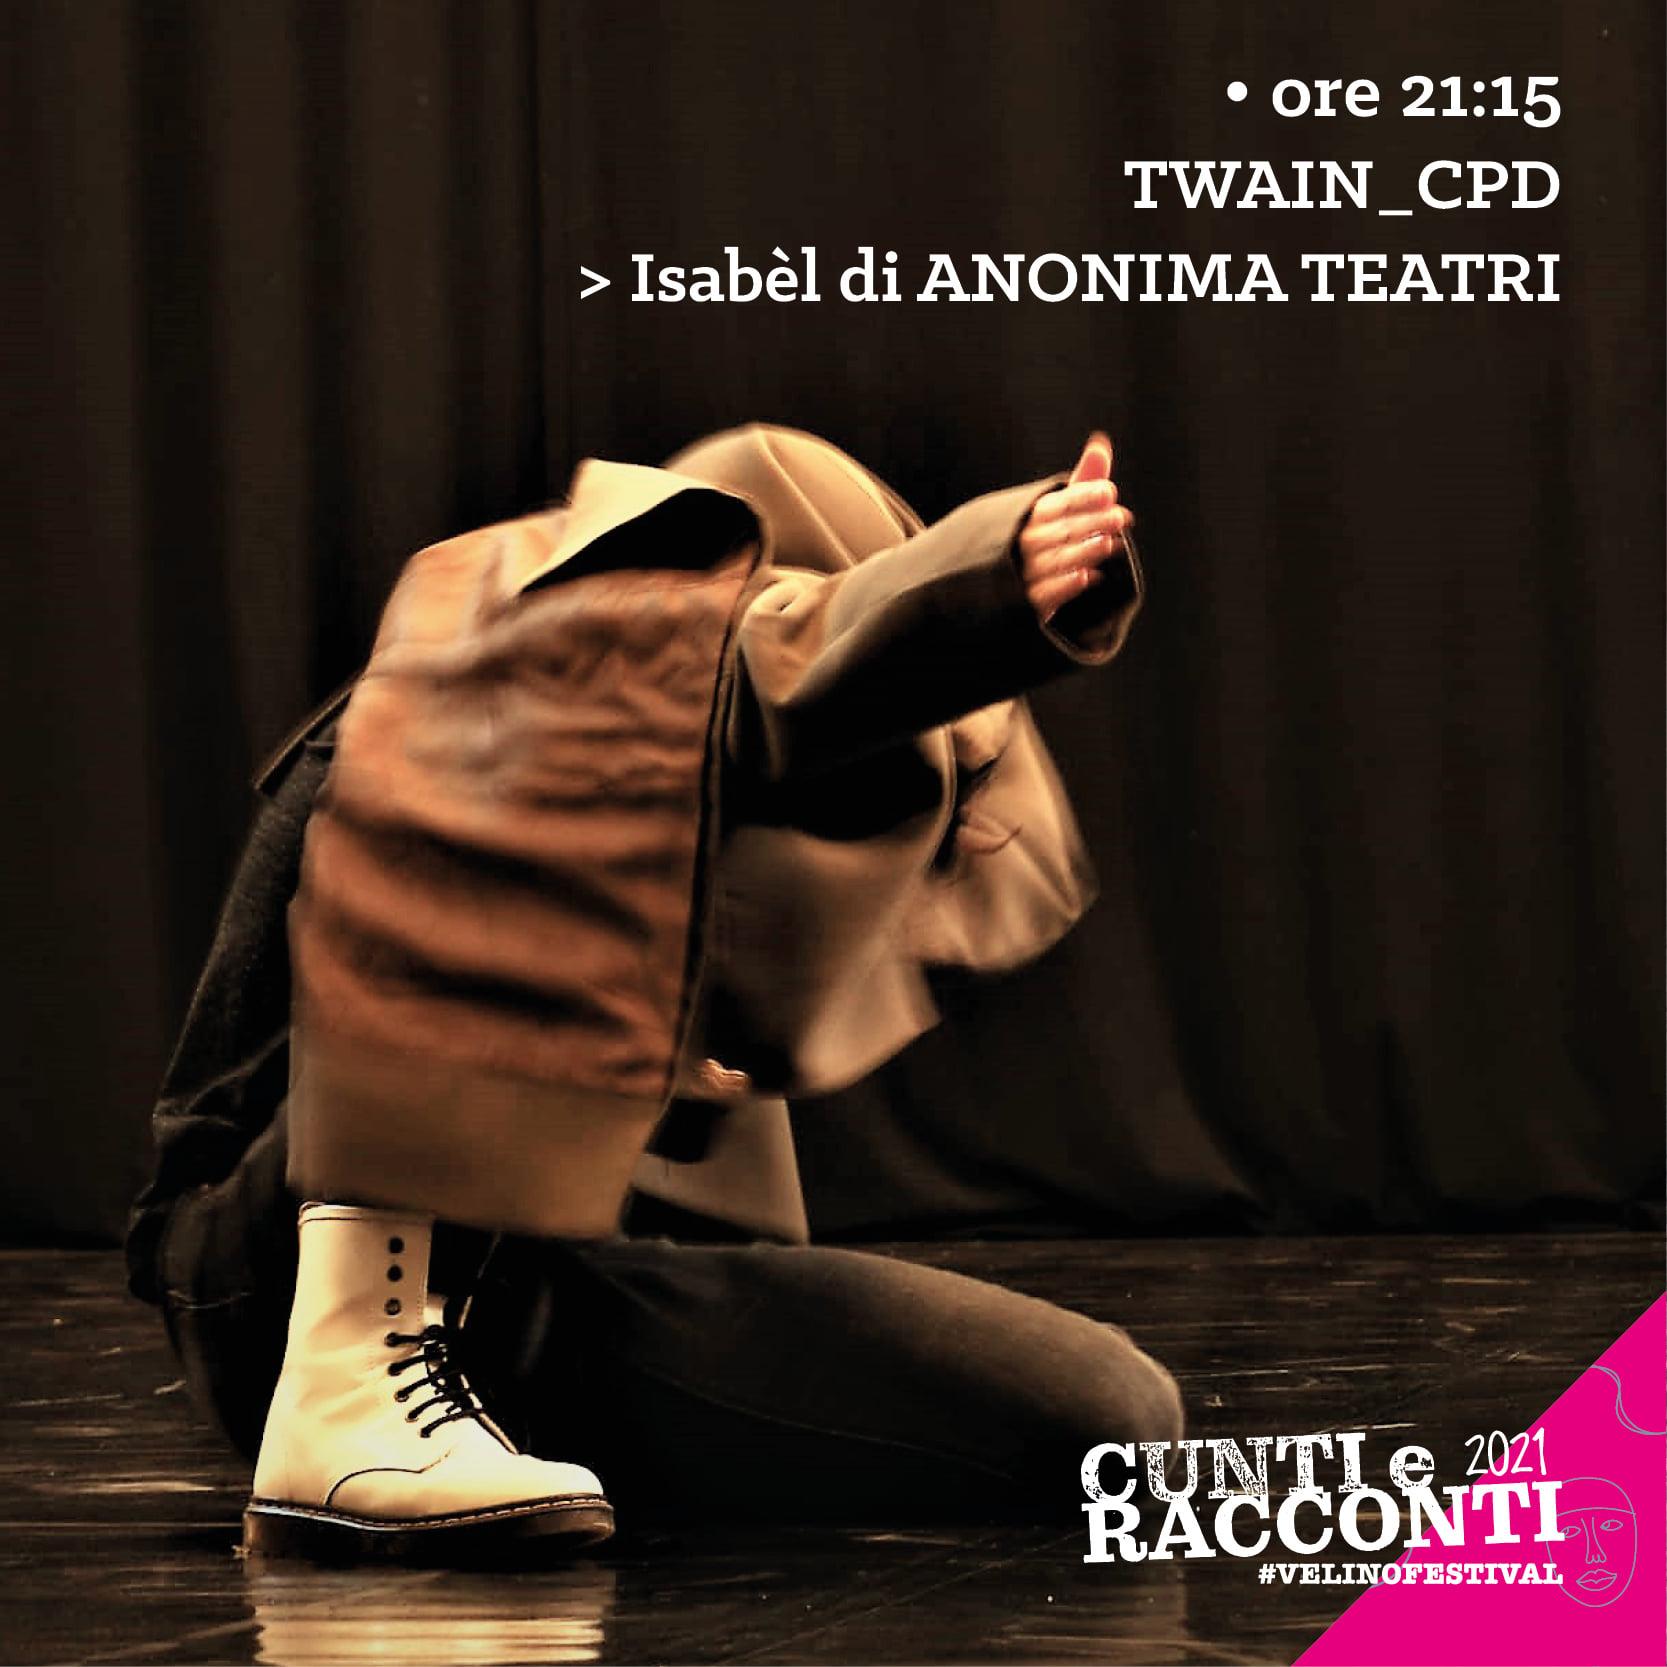 Cunti e Racconti Velino Festival / Twain_CPD/ Isabelle